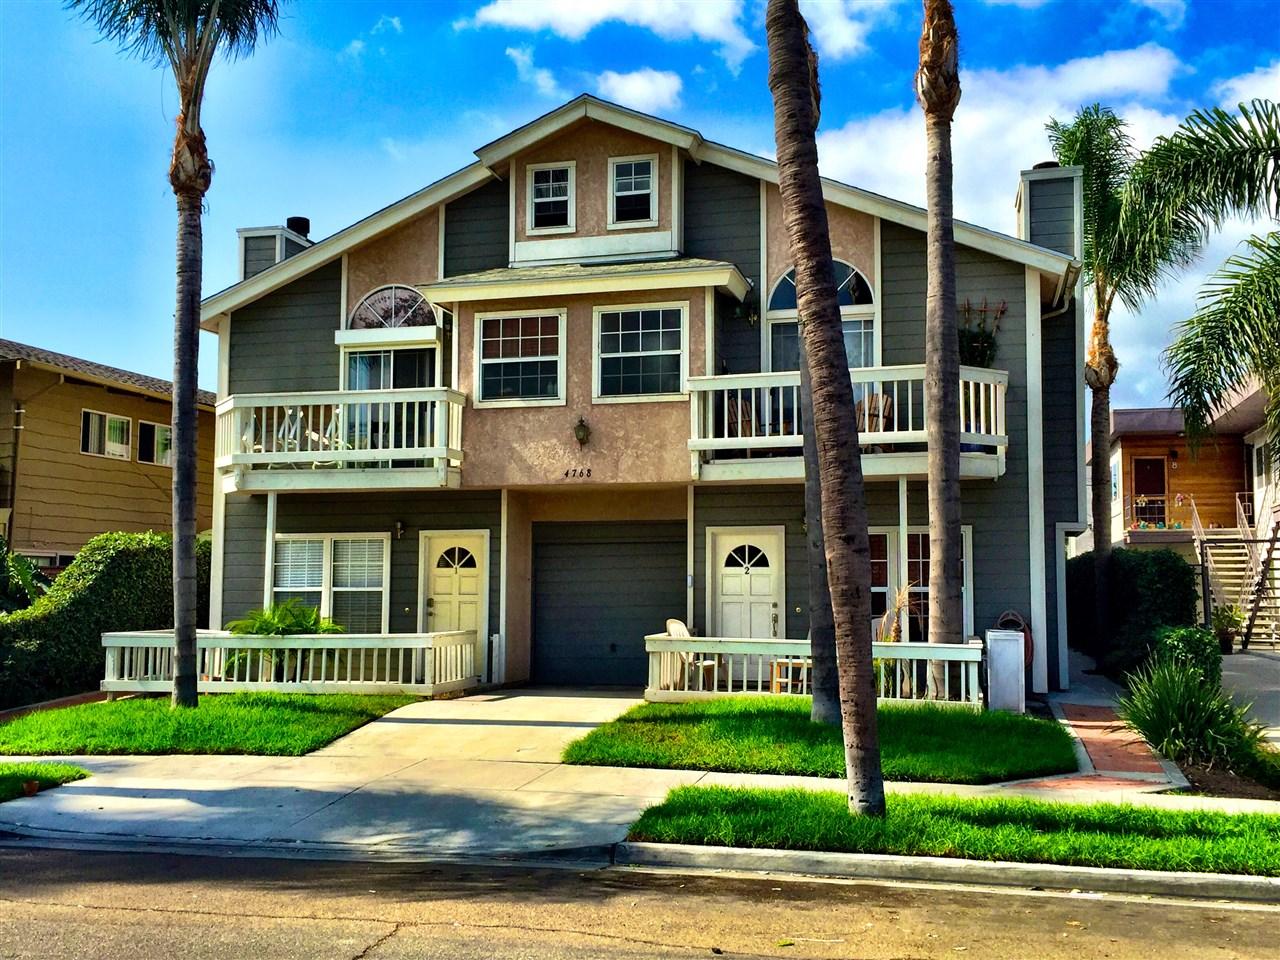 4768 Mansfield #APT 4, San Diego, CA